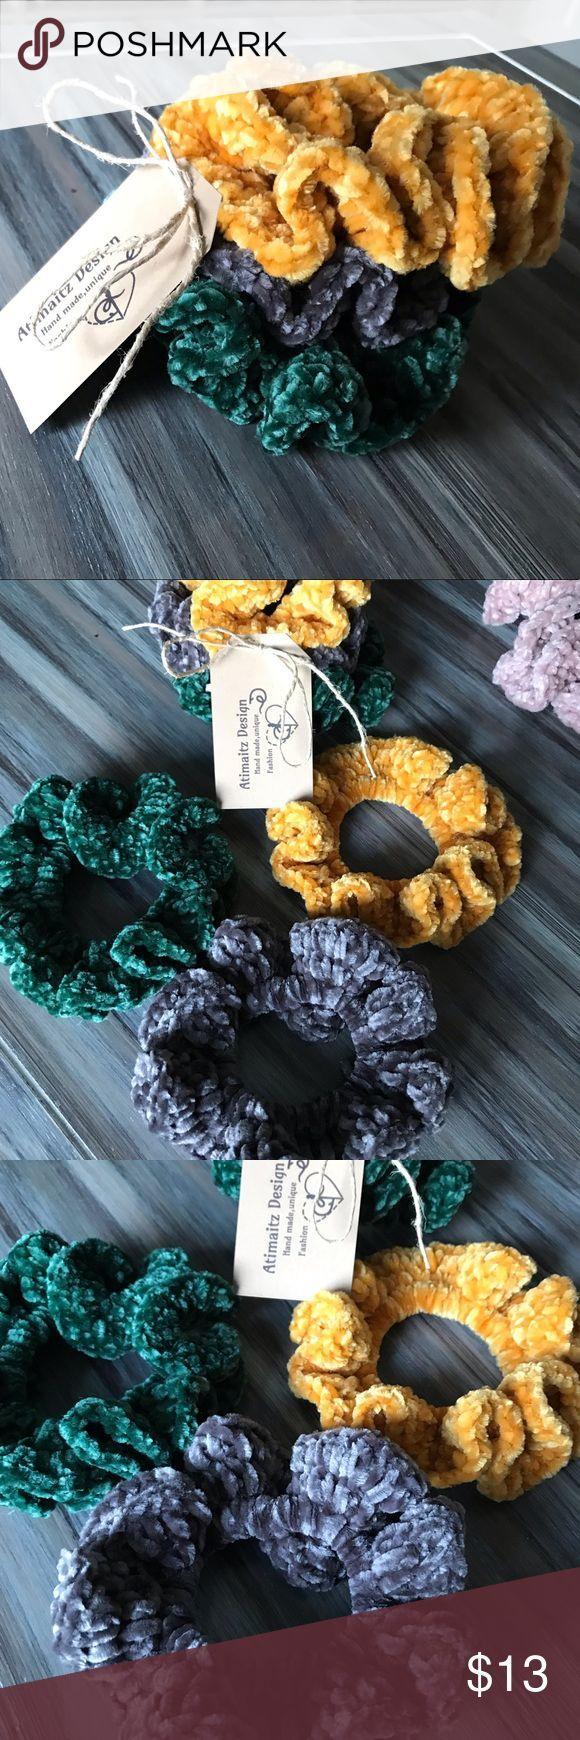 HAIR ACCESSORY SCRUNCHIE Velvet yarn handmade crocheted scrunchie 3 pieces, colo...,  #Access... #crochetscrunchies